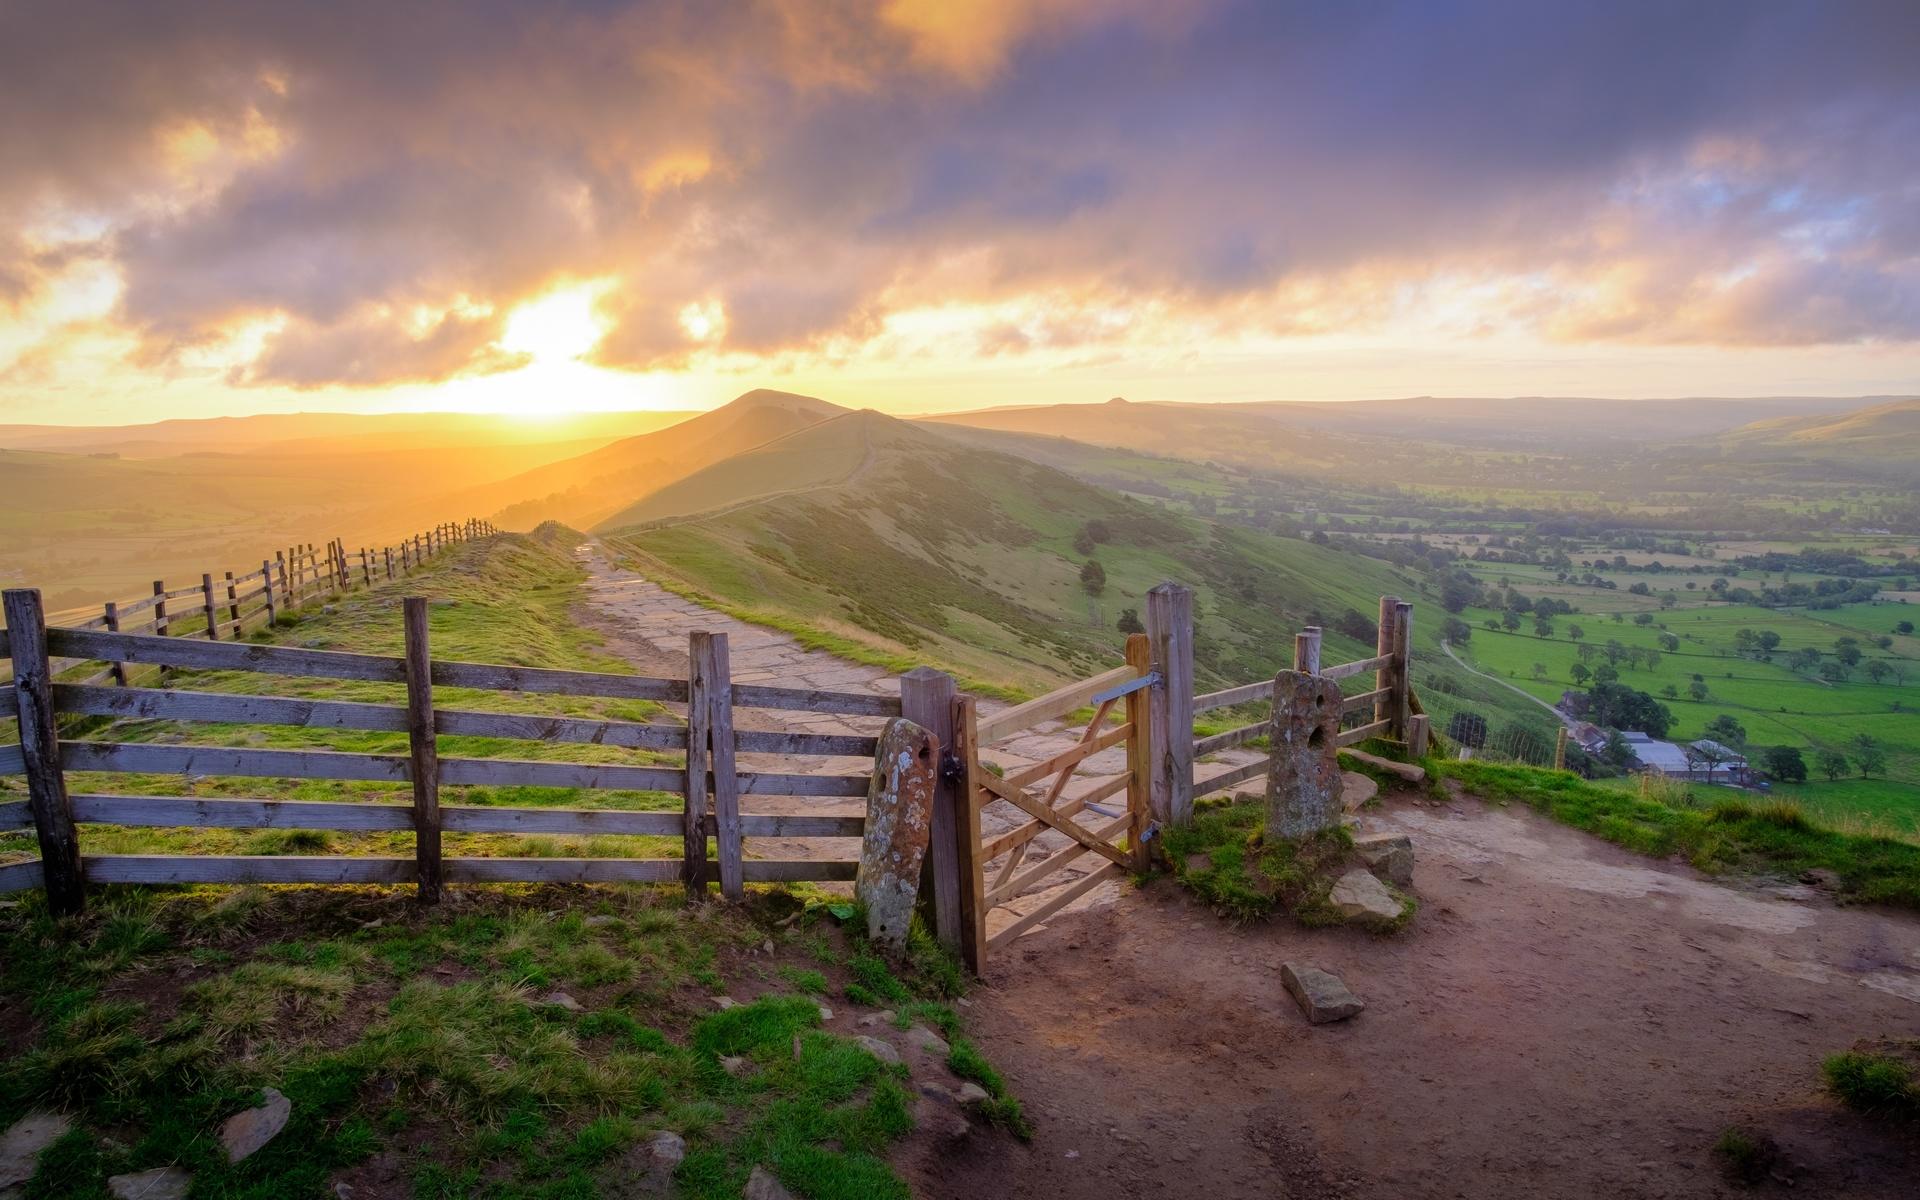 англия, peak-district, national park, derbyshire, забор, трава, холмы, горизонт, природа